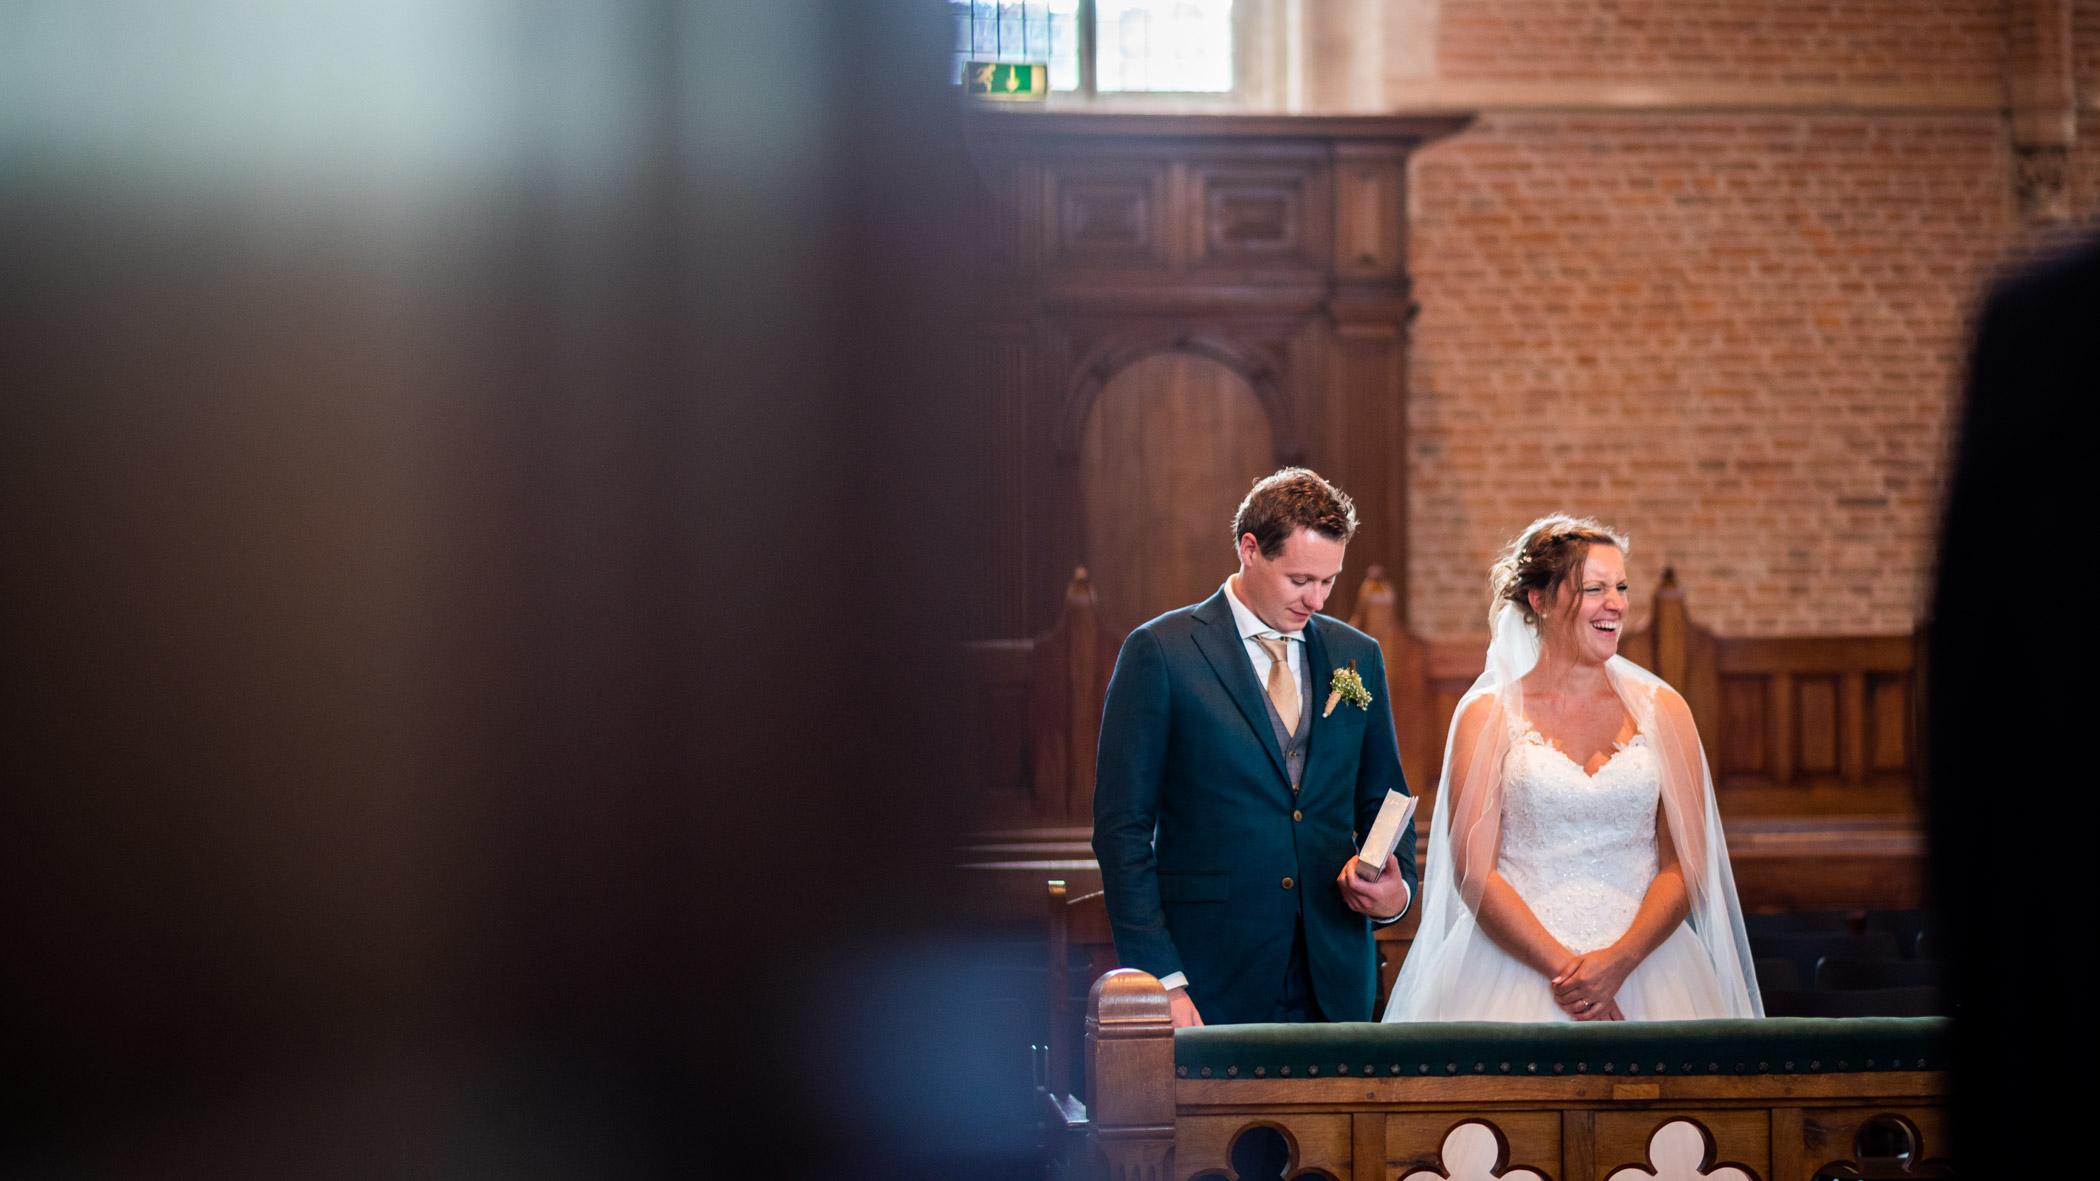 Bruiloft kerkdienst Cunerakerk Rhenen